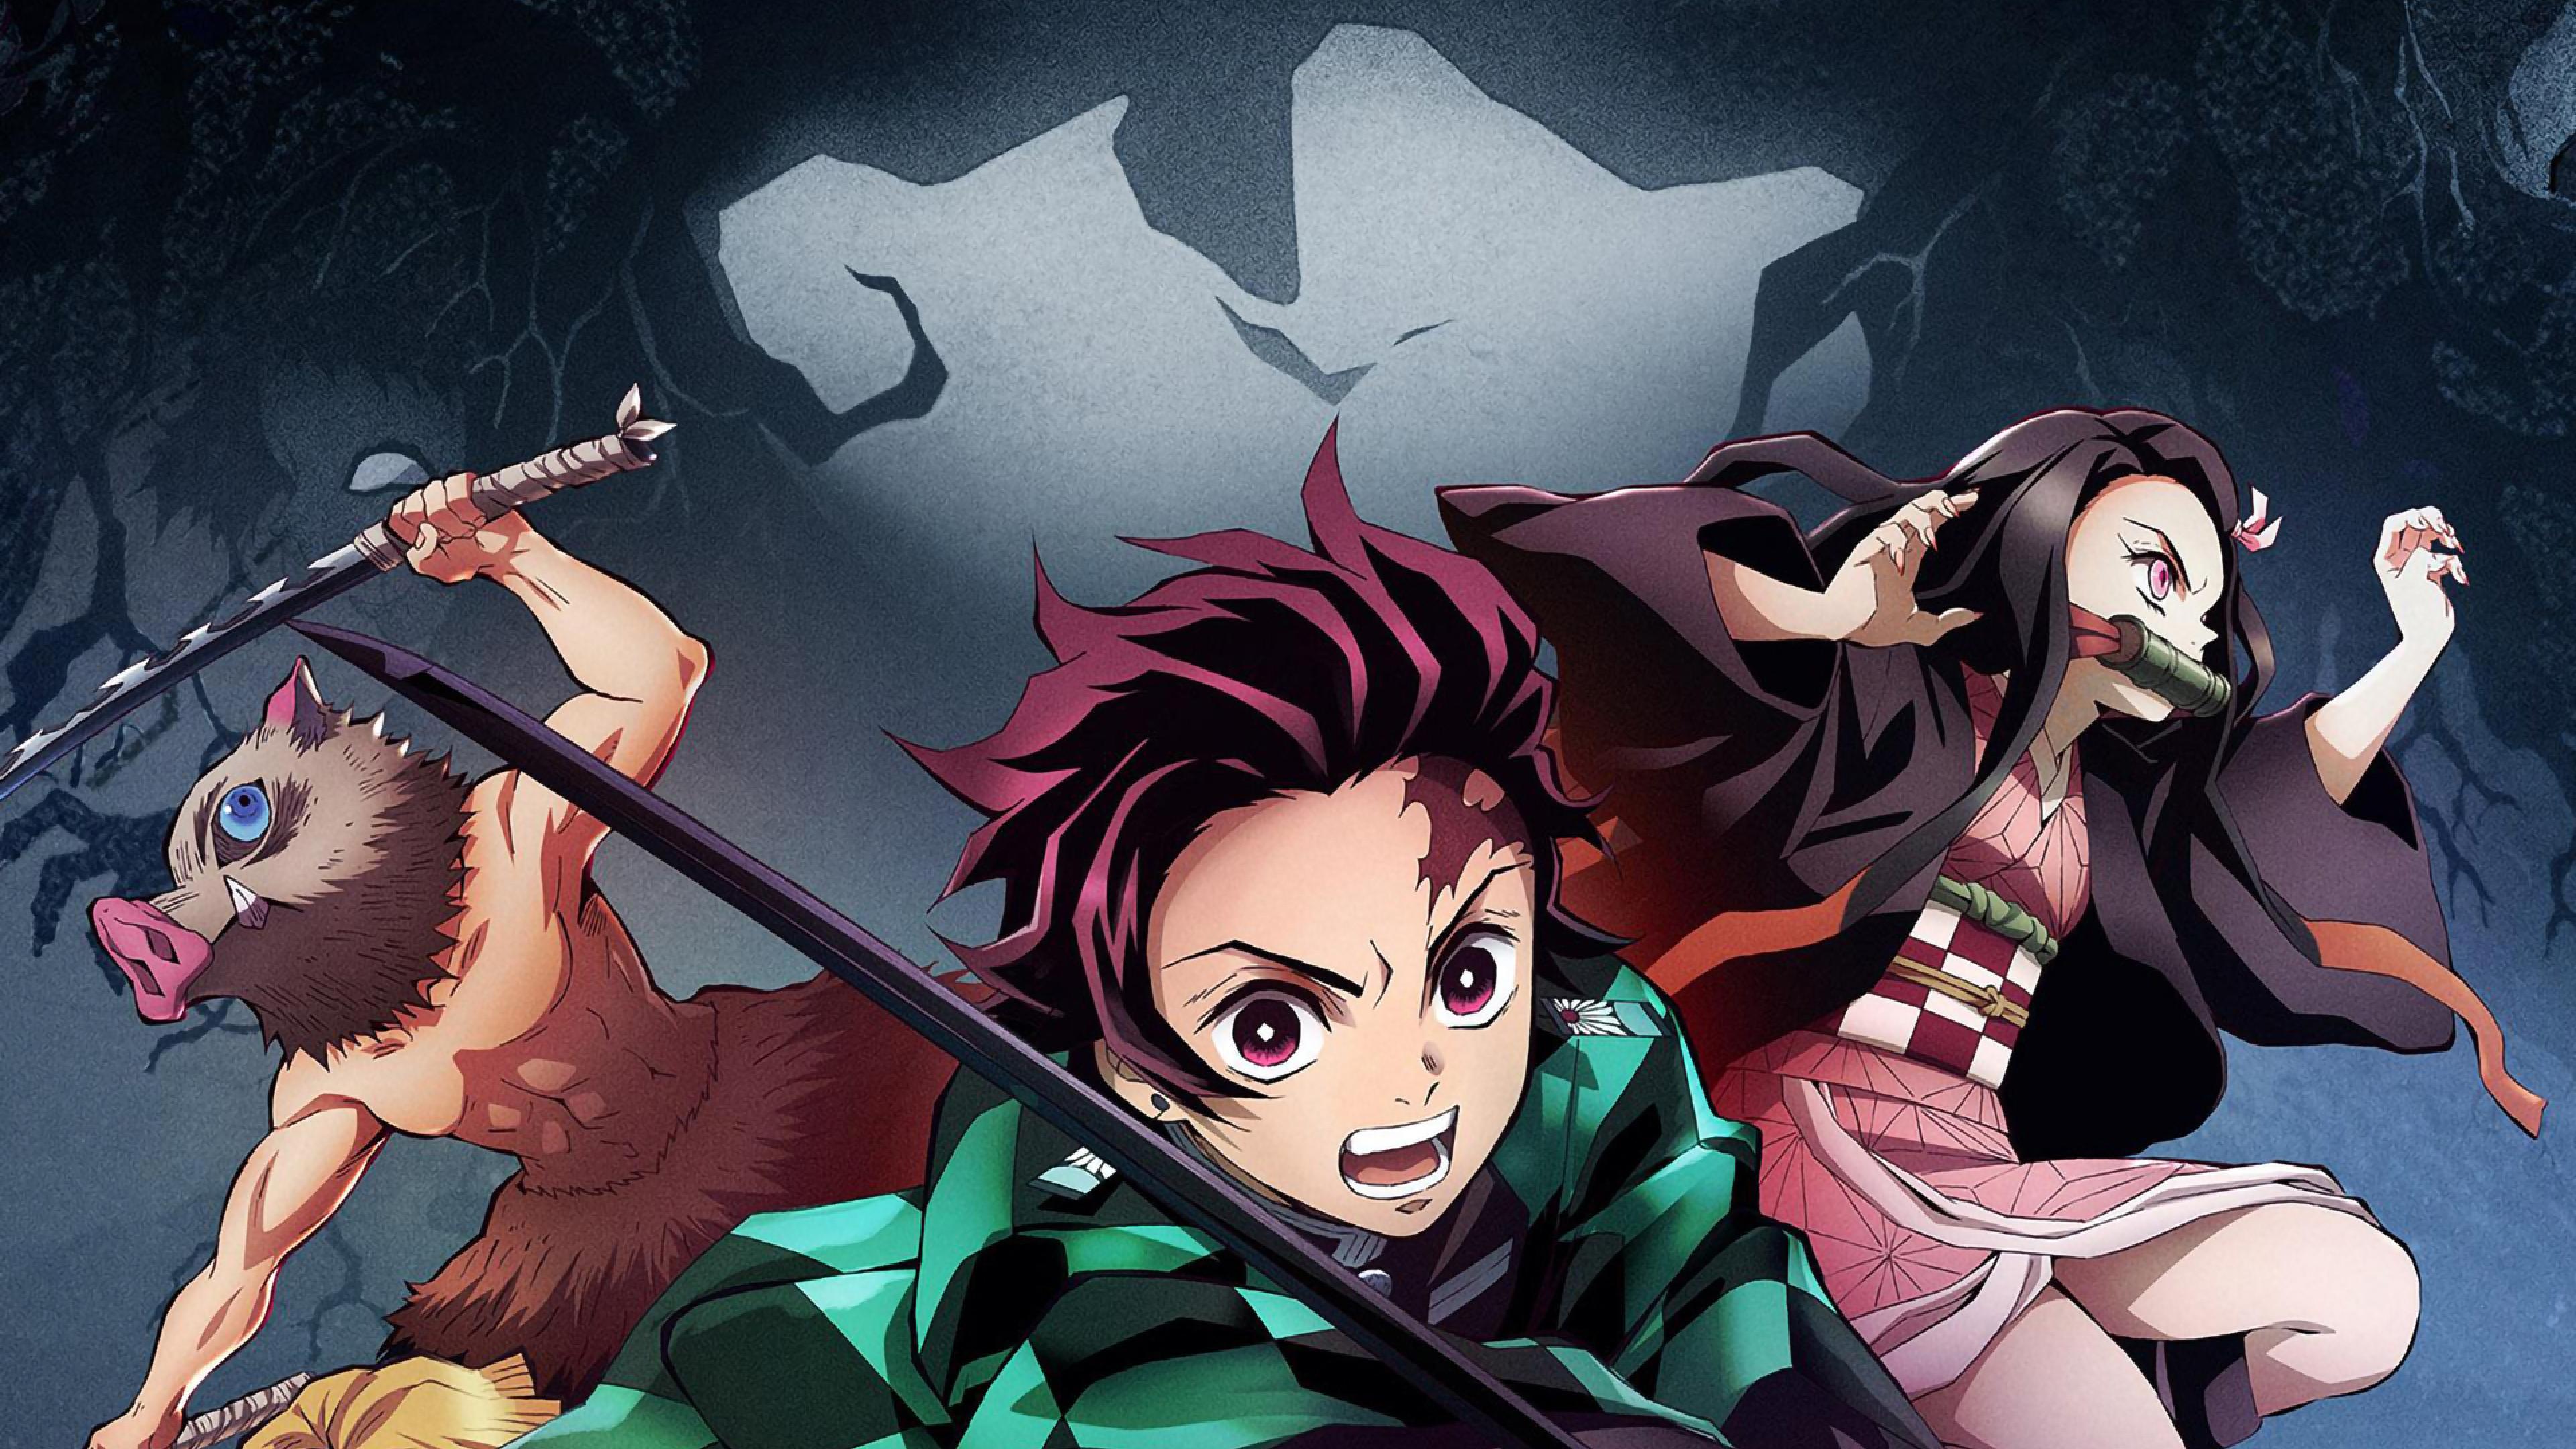 24+ 4k Resolution Ultra Hd 4k Anime Wallpaper Demon Slayer